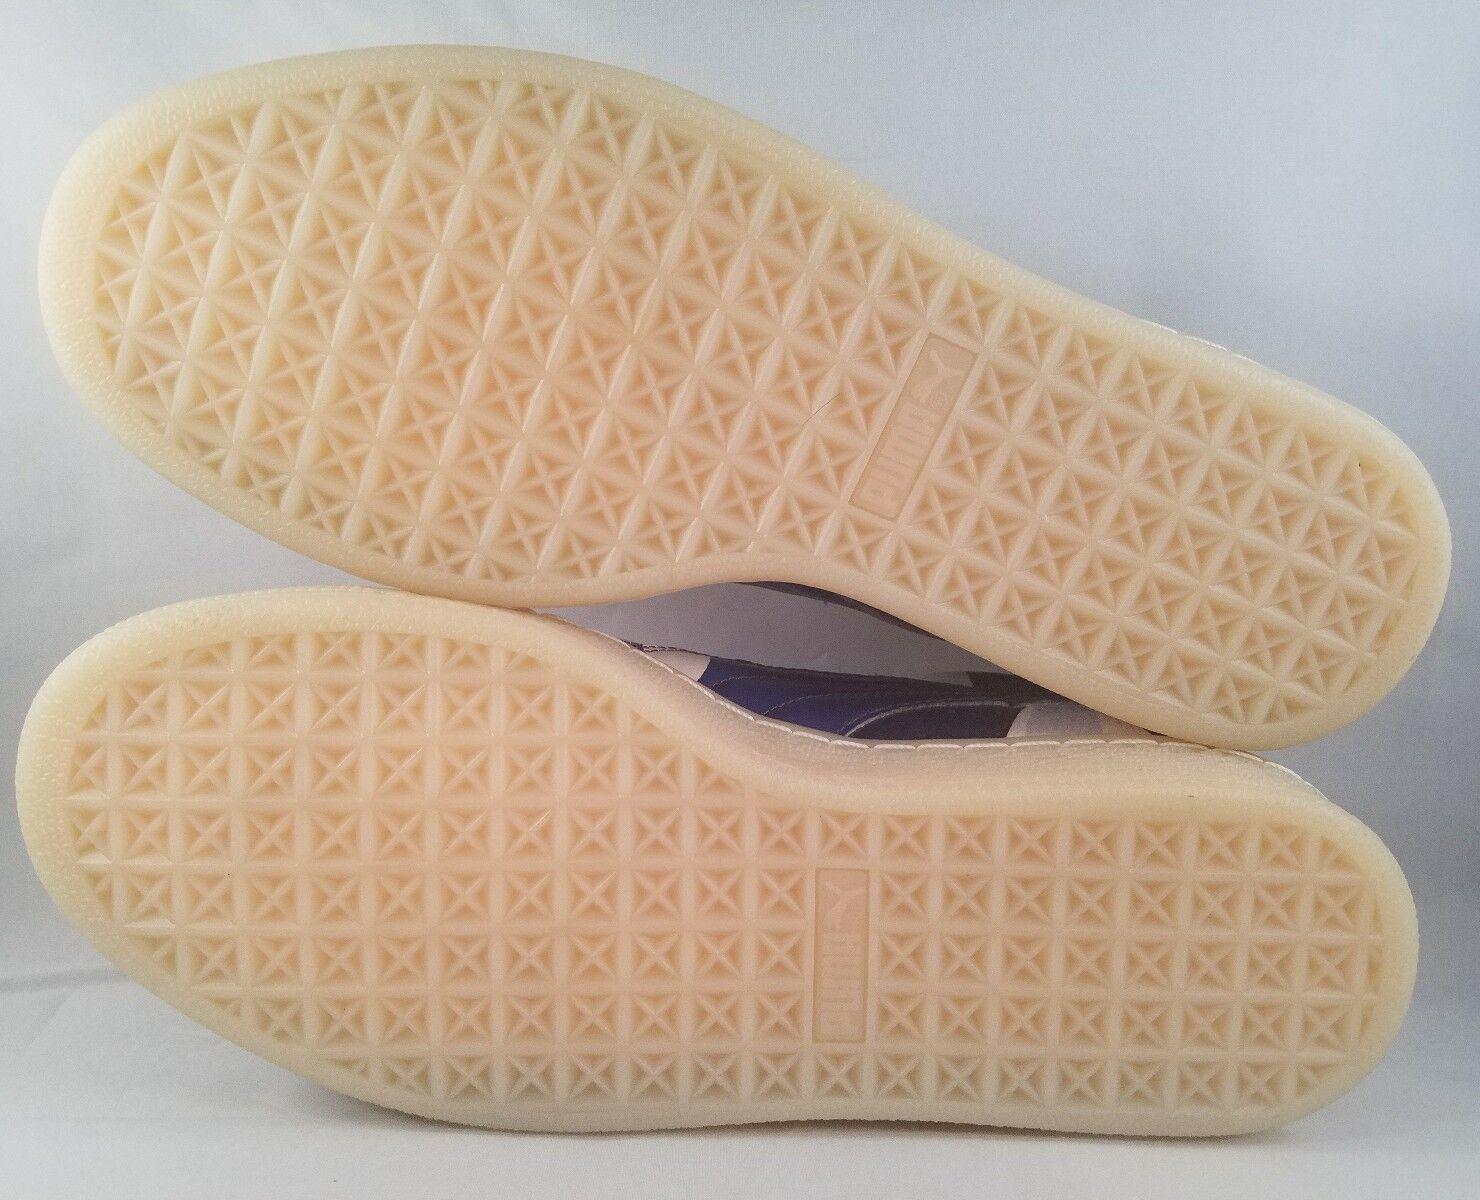 Puma x Careaux Basket scarpe Uomo Dimensione 8 Graphic Graphic Graphic Twilight blu Halogen 363435-01 8a9020